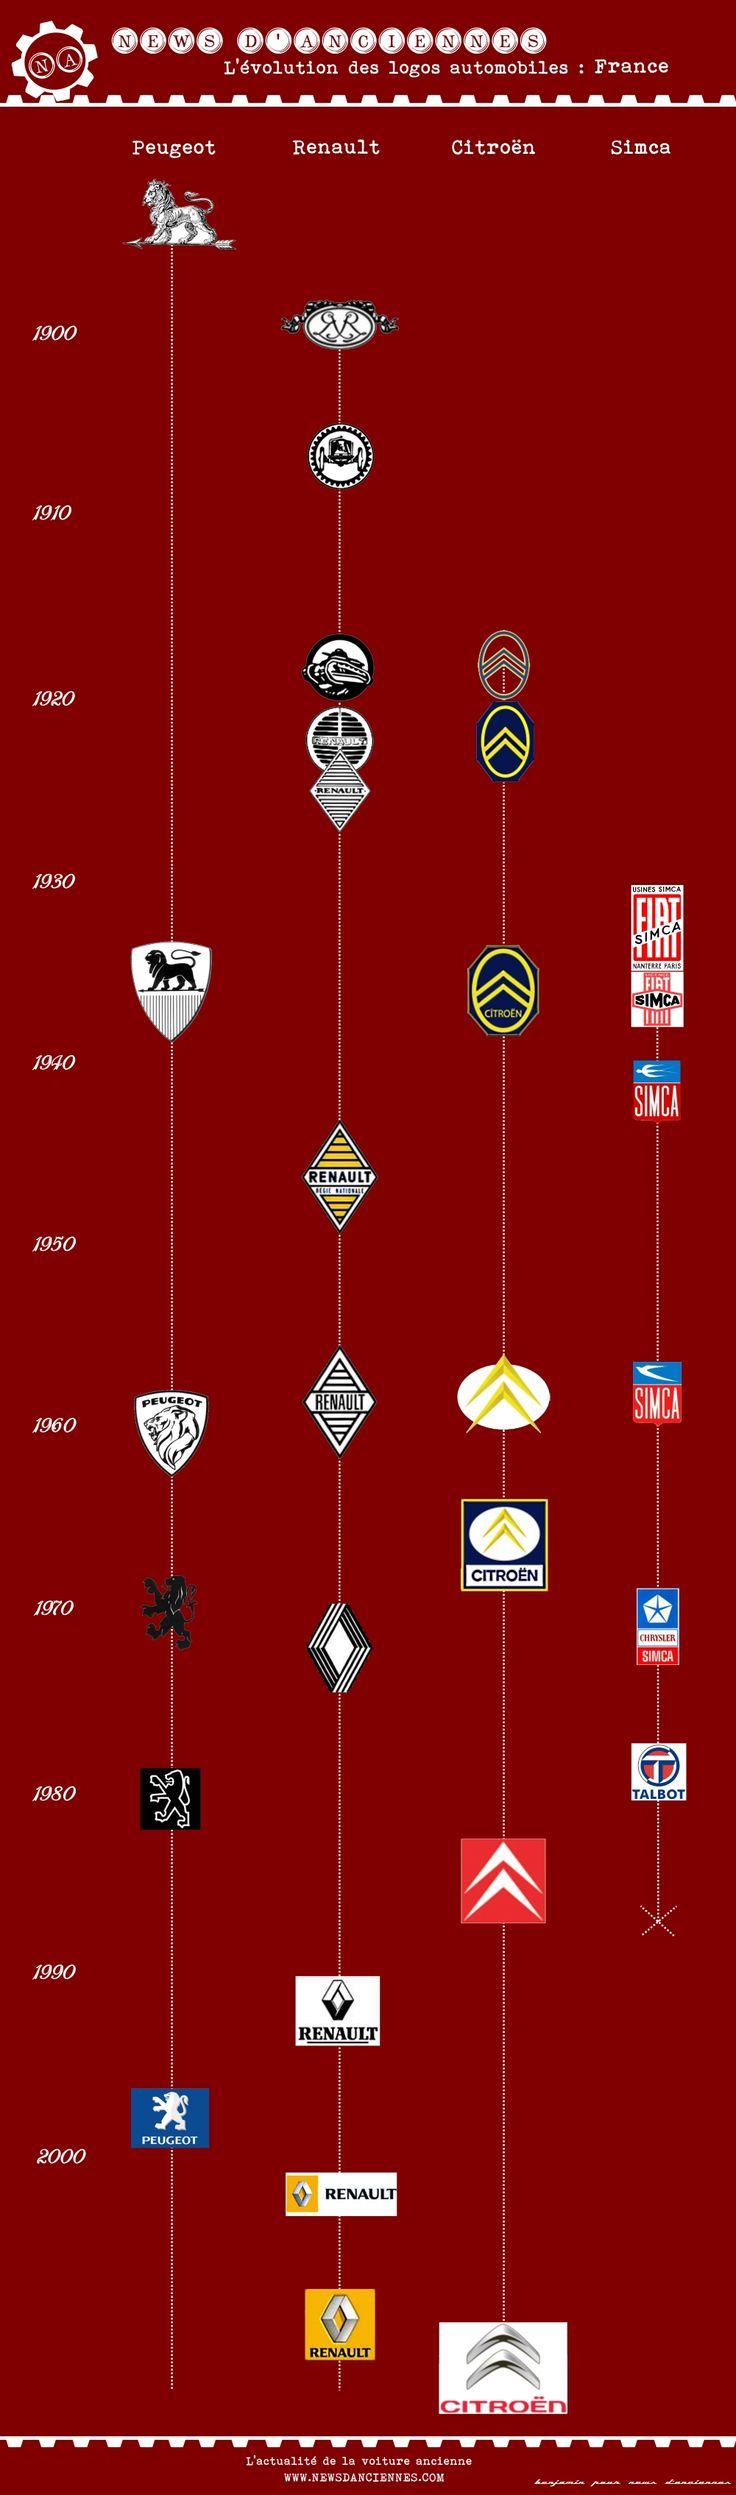 Evolution des #logos des #constructeurs #automobiles #français Article original : http://newsdanciennes.com/2015/04/17/levolution-des-logos-automobiles-en-images/ Issu de l'article : Evolution des Logos Constructeurs Automobiles en Images #Renault #Citroën #Peugeot #Simca